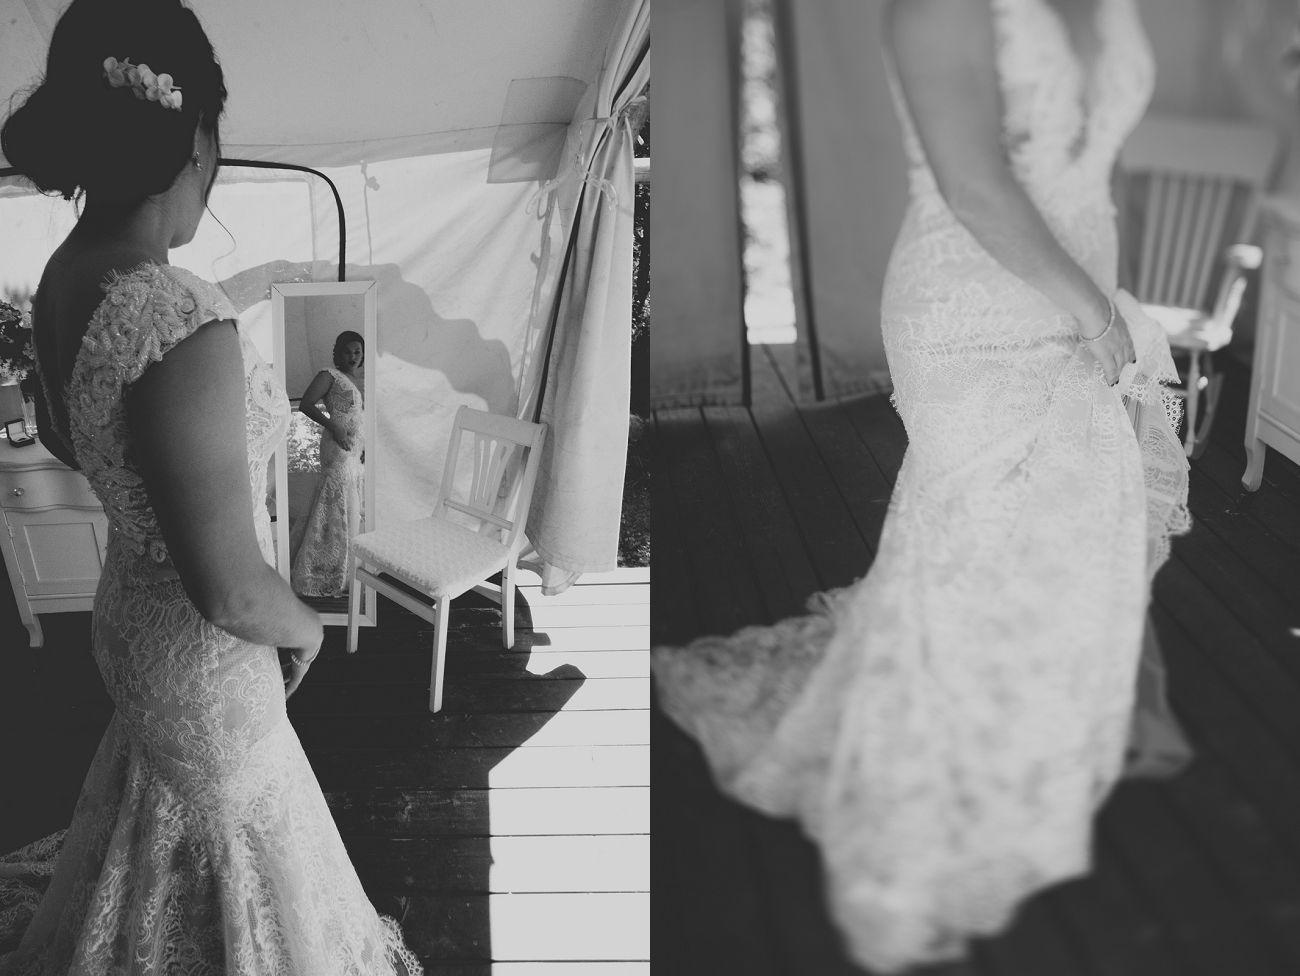 Jennifer_Mooney_Photo_Glacier_Park_Weddings_Elopement_00012.jpg